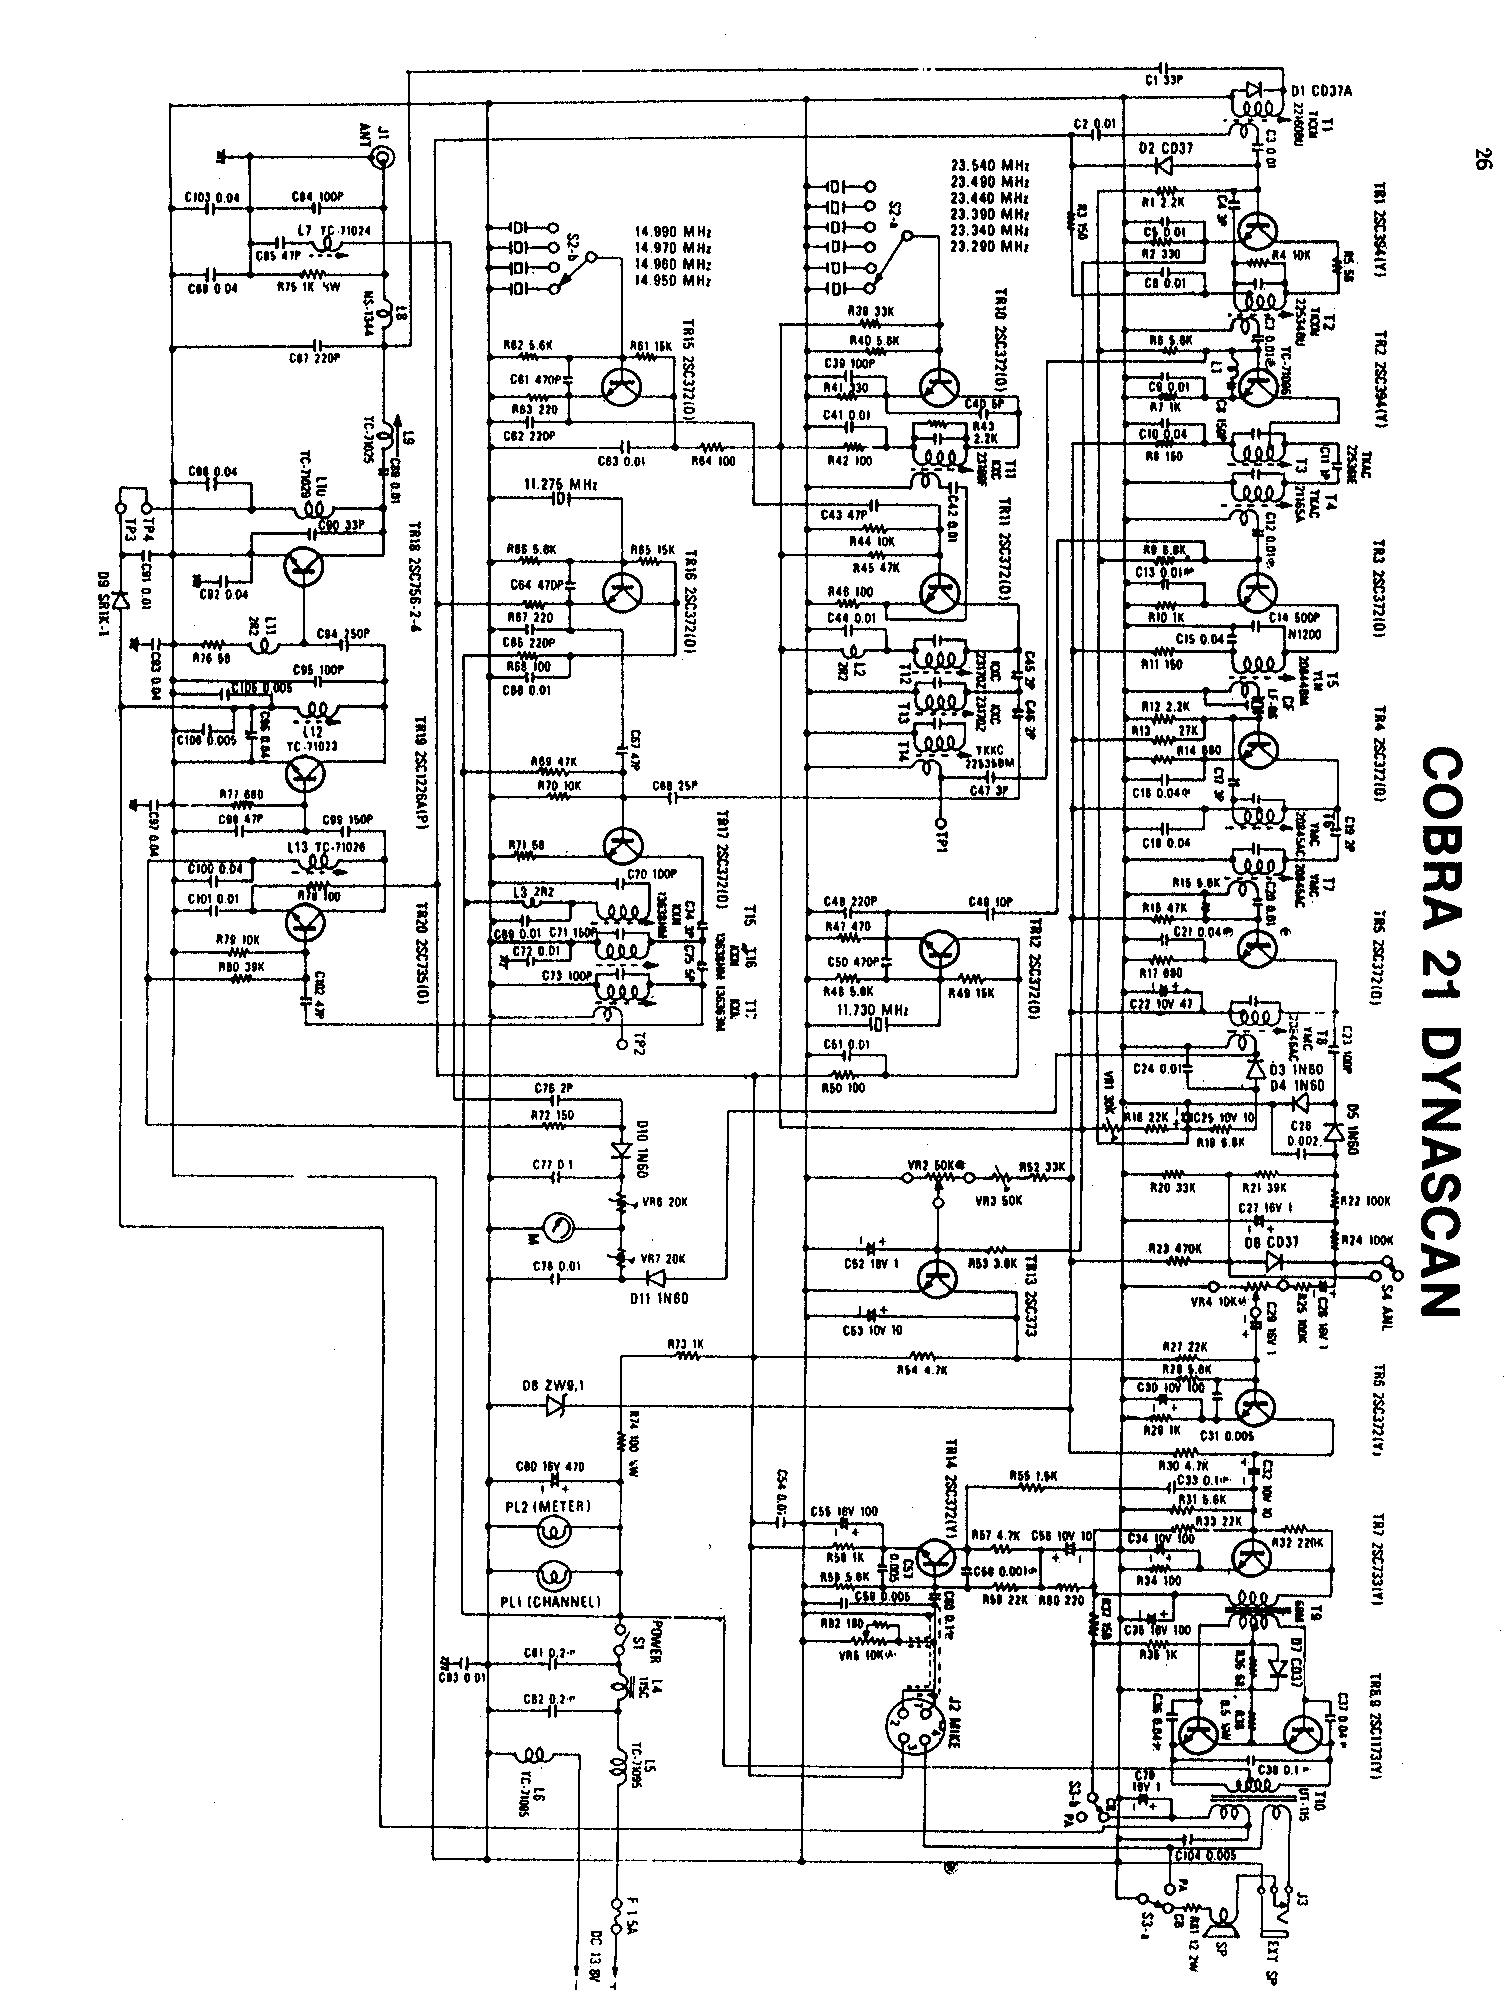 Schemi Elettrici Radio Cb : Schemi elettrici vari